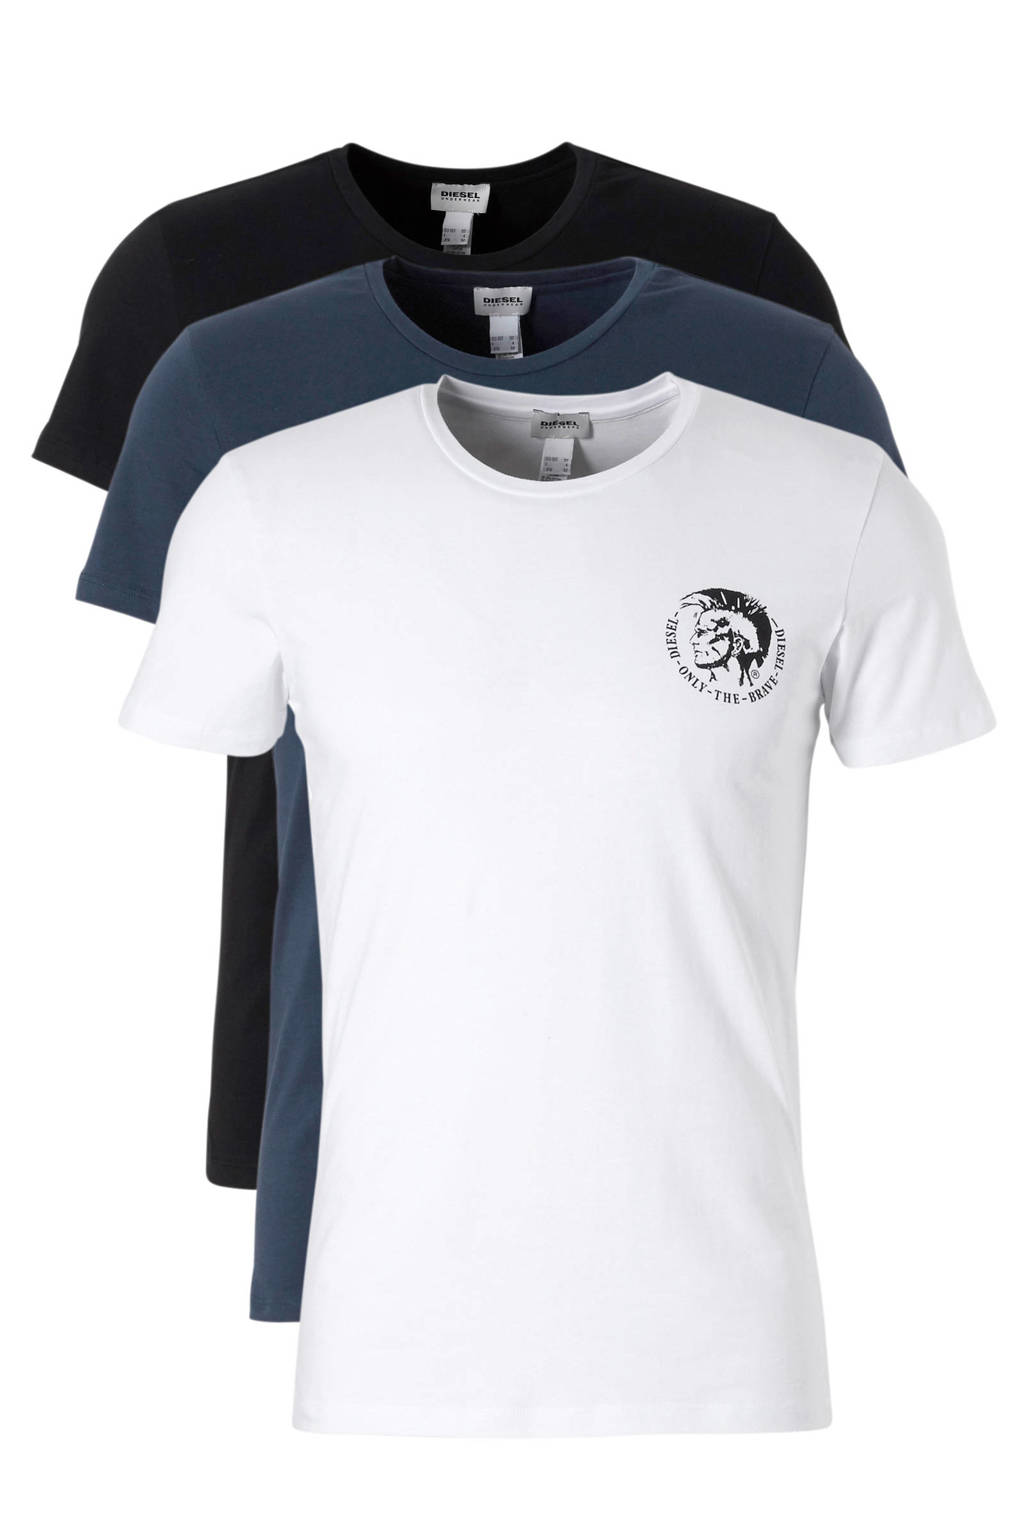 Diesel katoenen t-shirt Randal - set van 3, Zwart / wit / blauw